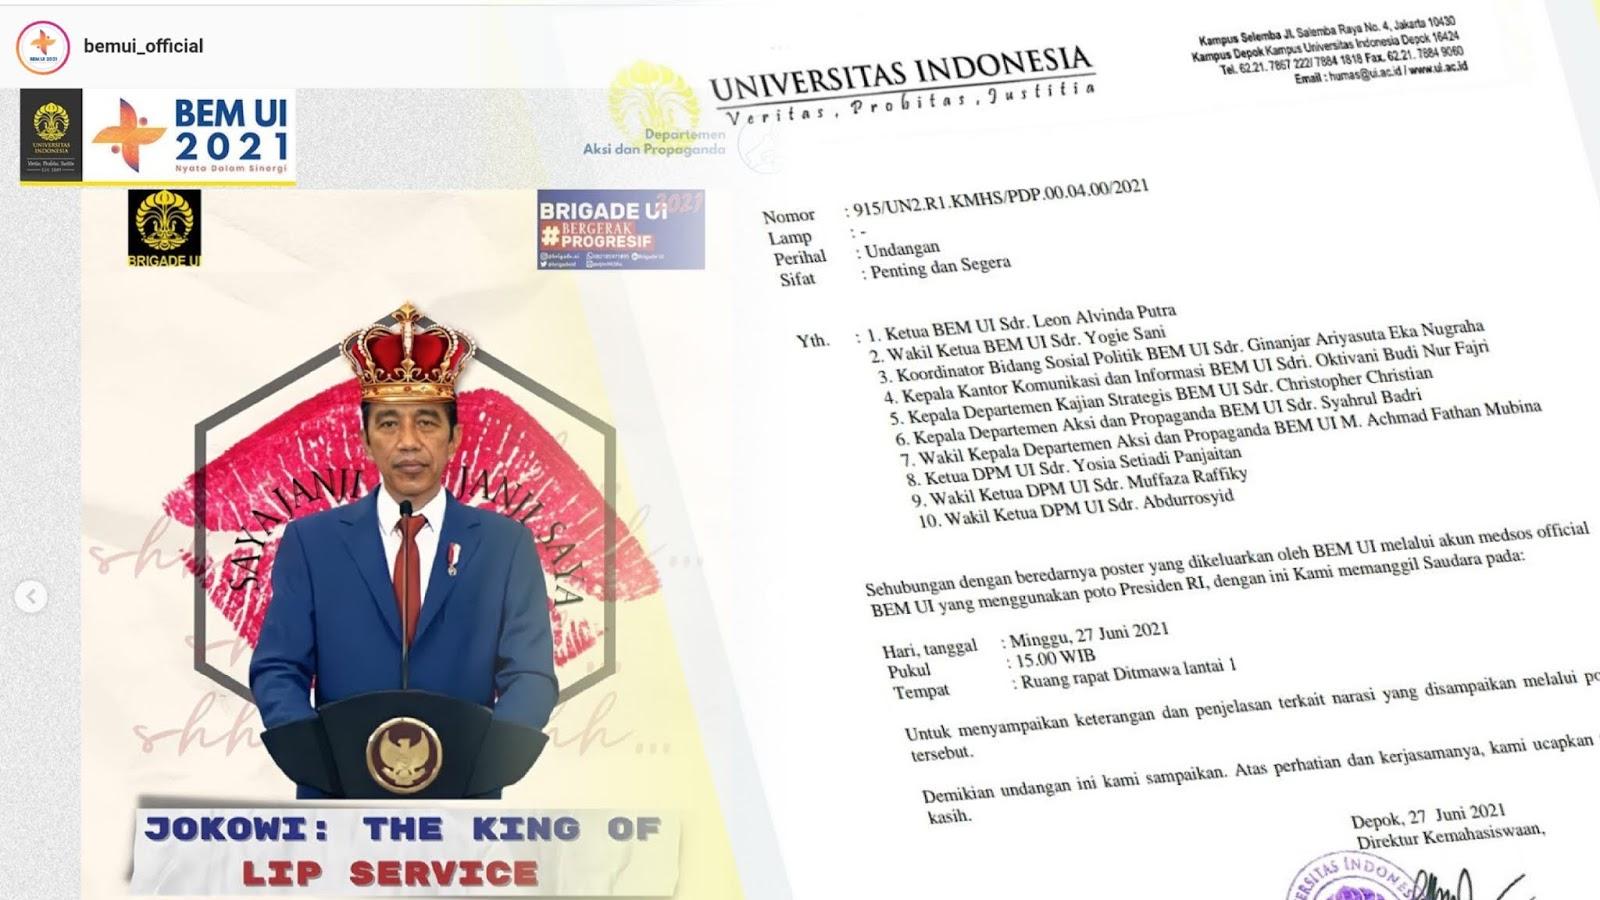 Waduh! Buntut Postingan 'Jokowi The King of Lip Service', Rektorat Panggil BEM UI